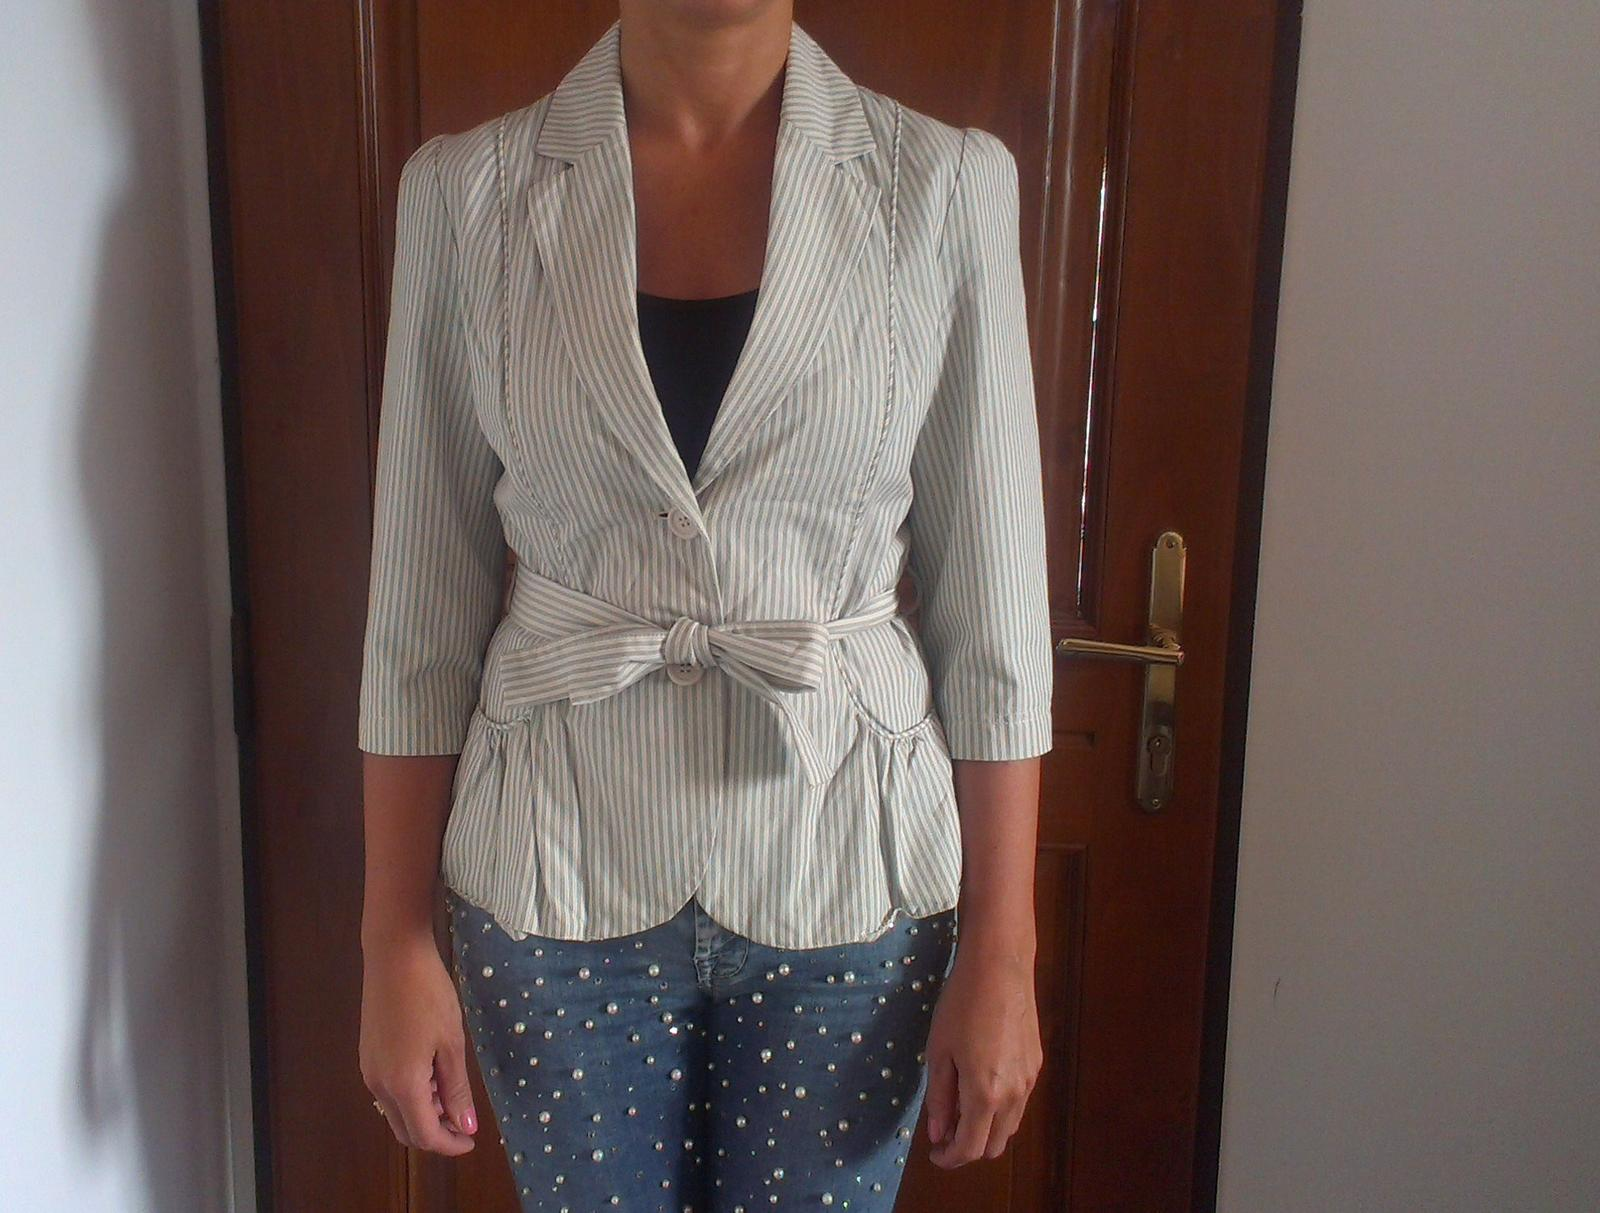 Elegantne sako s 3/4rukávmi značky Marks&Spencer  - Obrázok č. 1